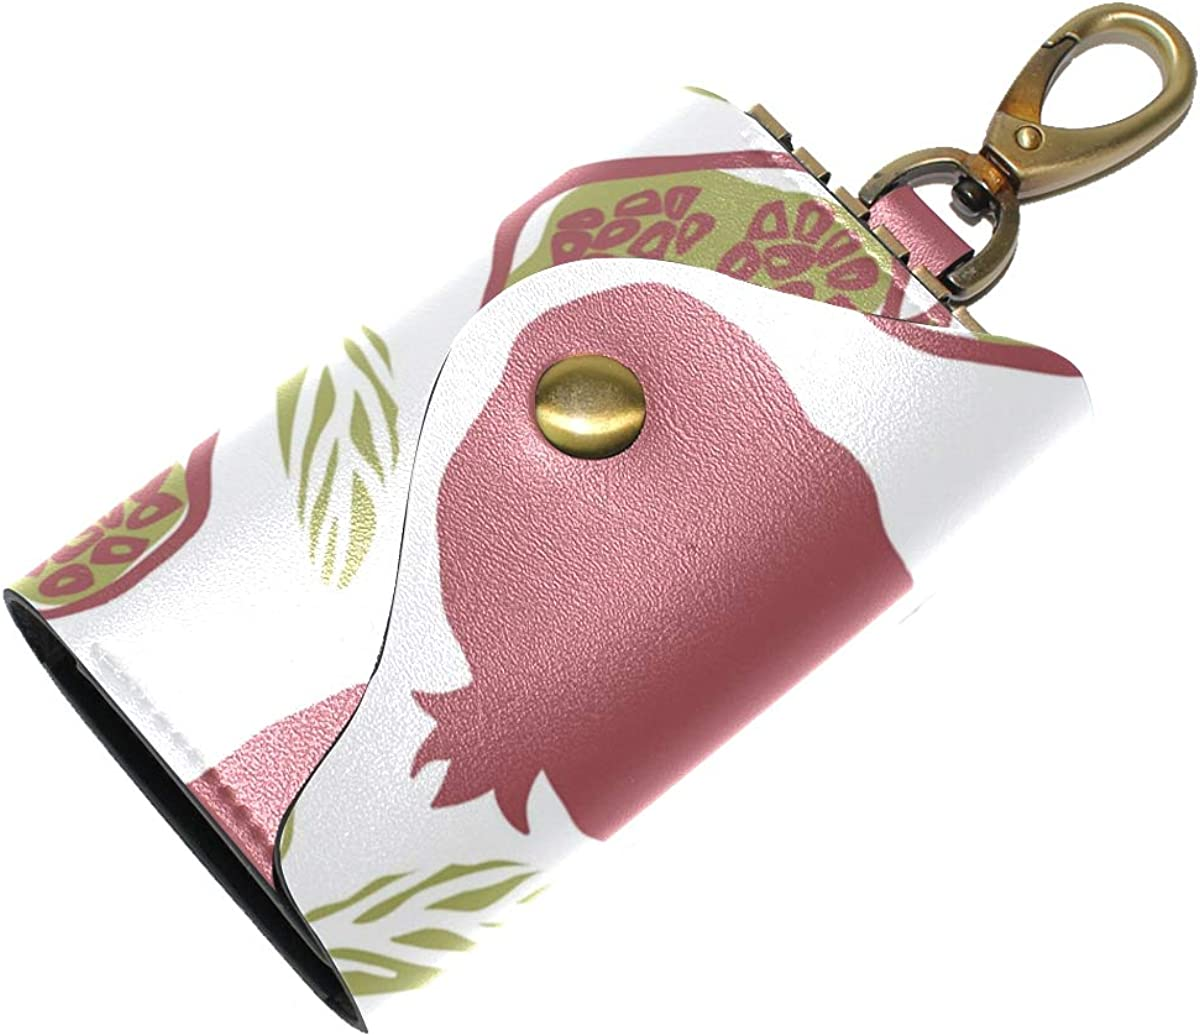 KEAKIA Fruits Leather Key Case Wallets Tri-fold Key Holder Keychains with 6 Hooks 2 Slot Snap Closure for Men Women